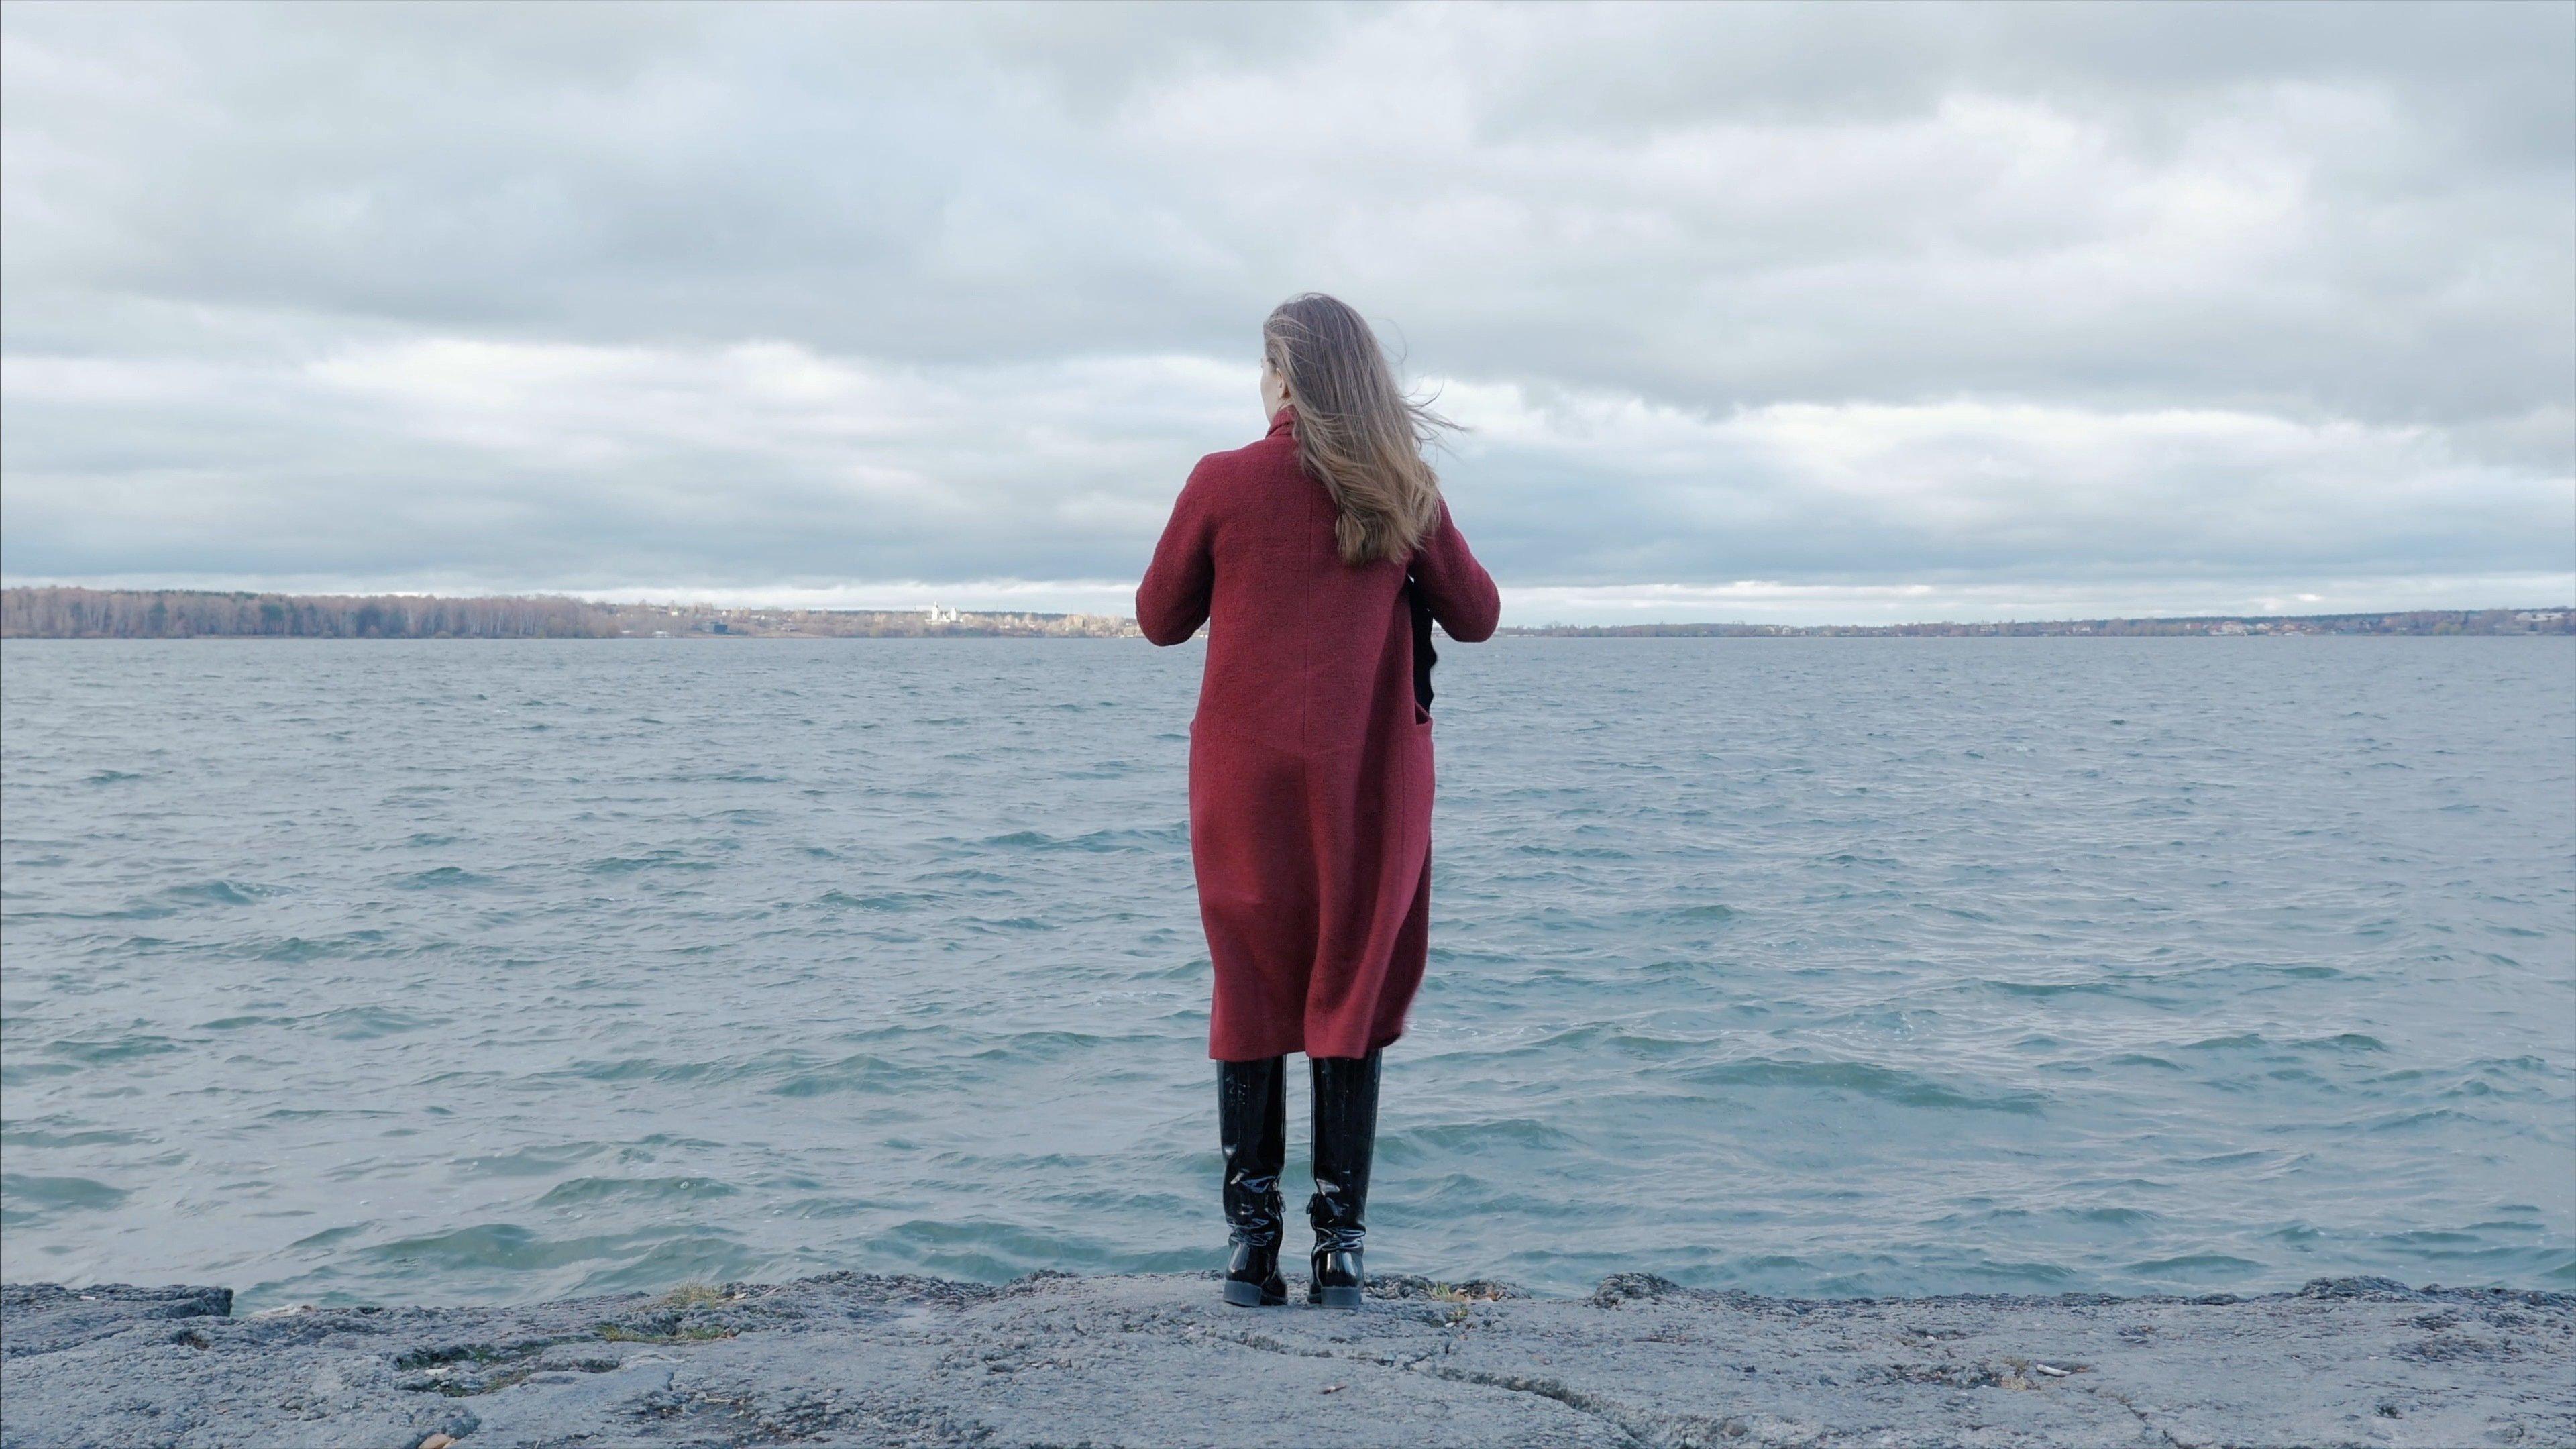 Woman standing on the beach. | Photo: Shutterstock